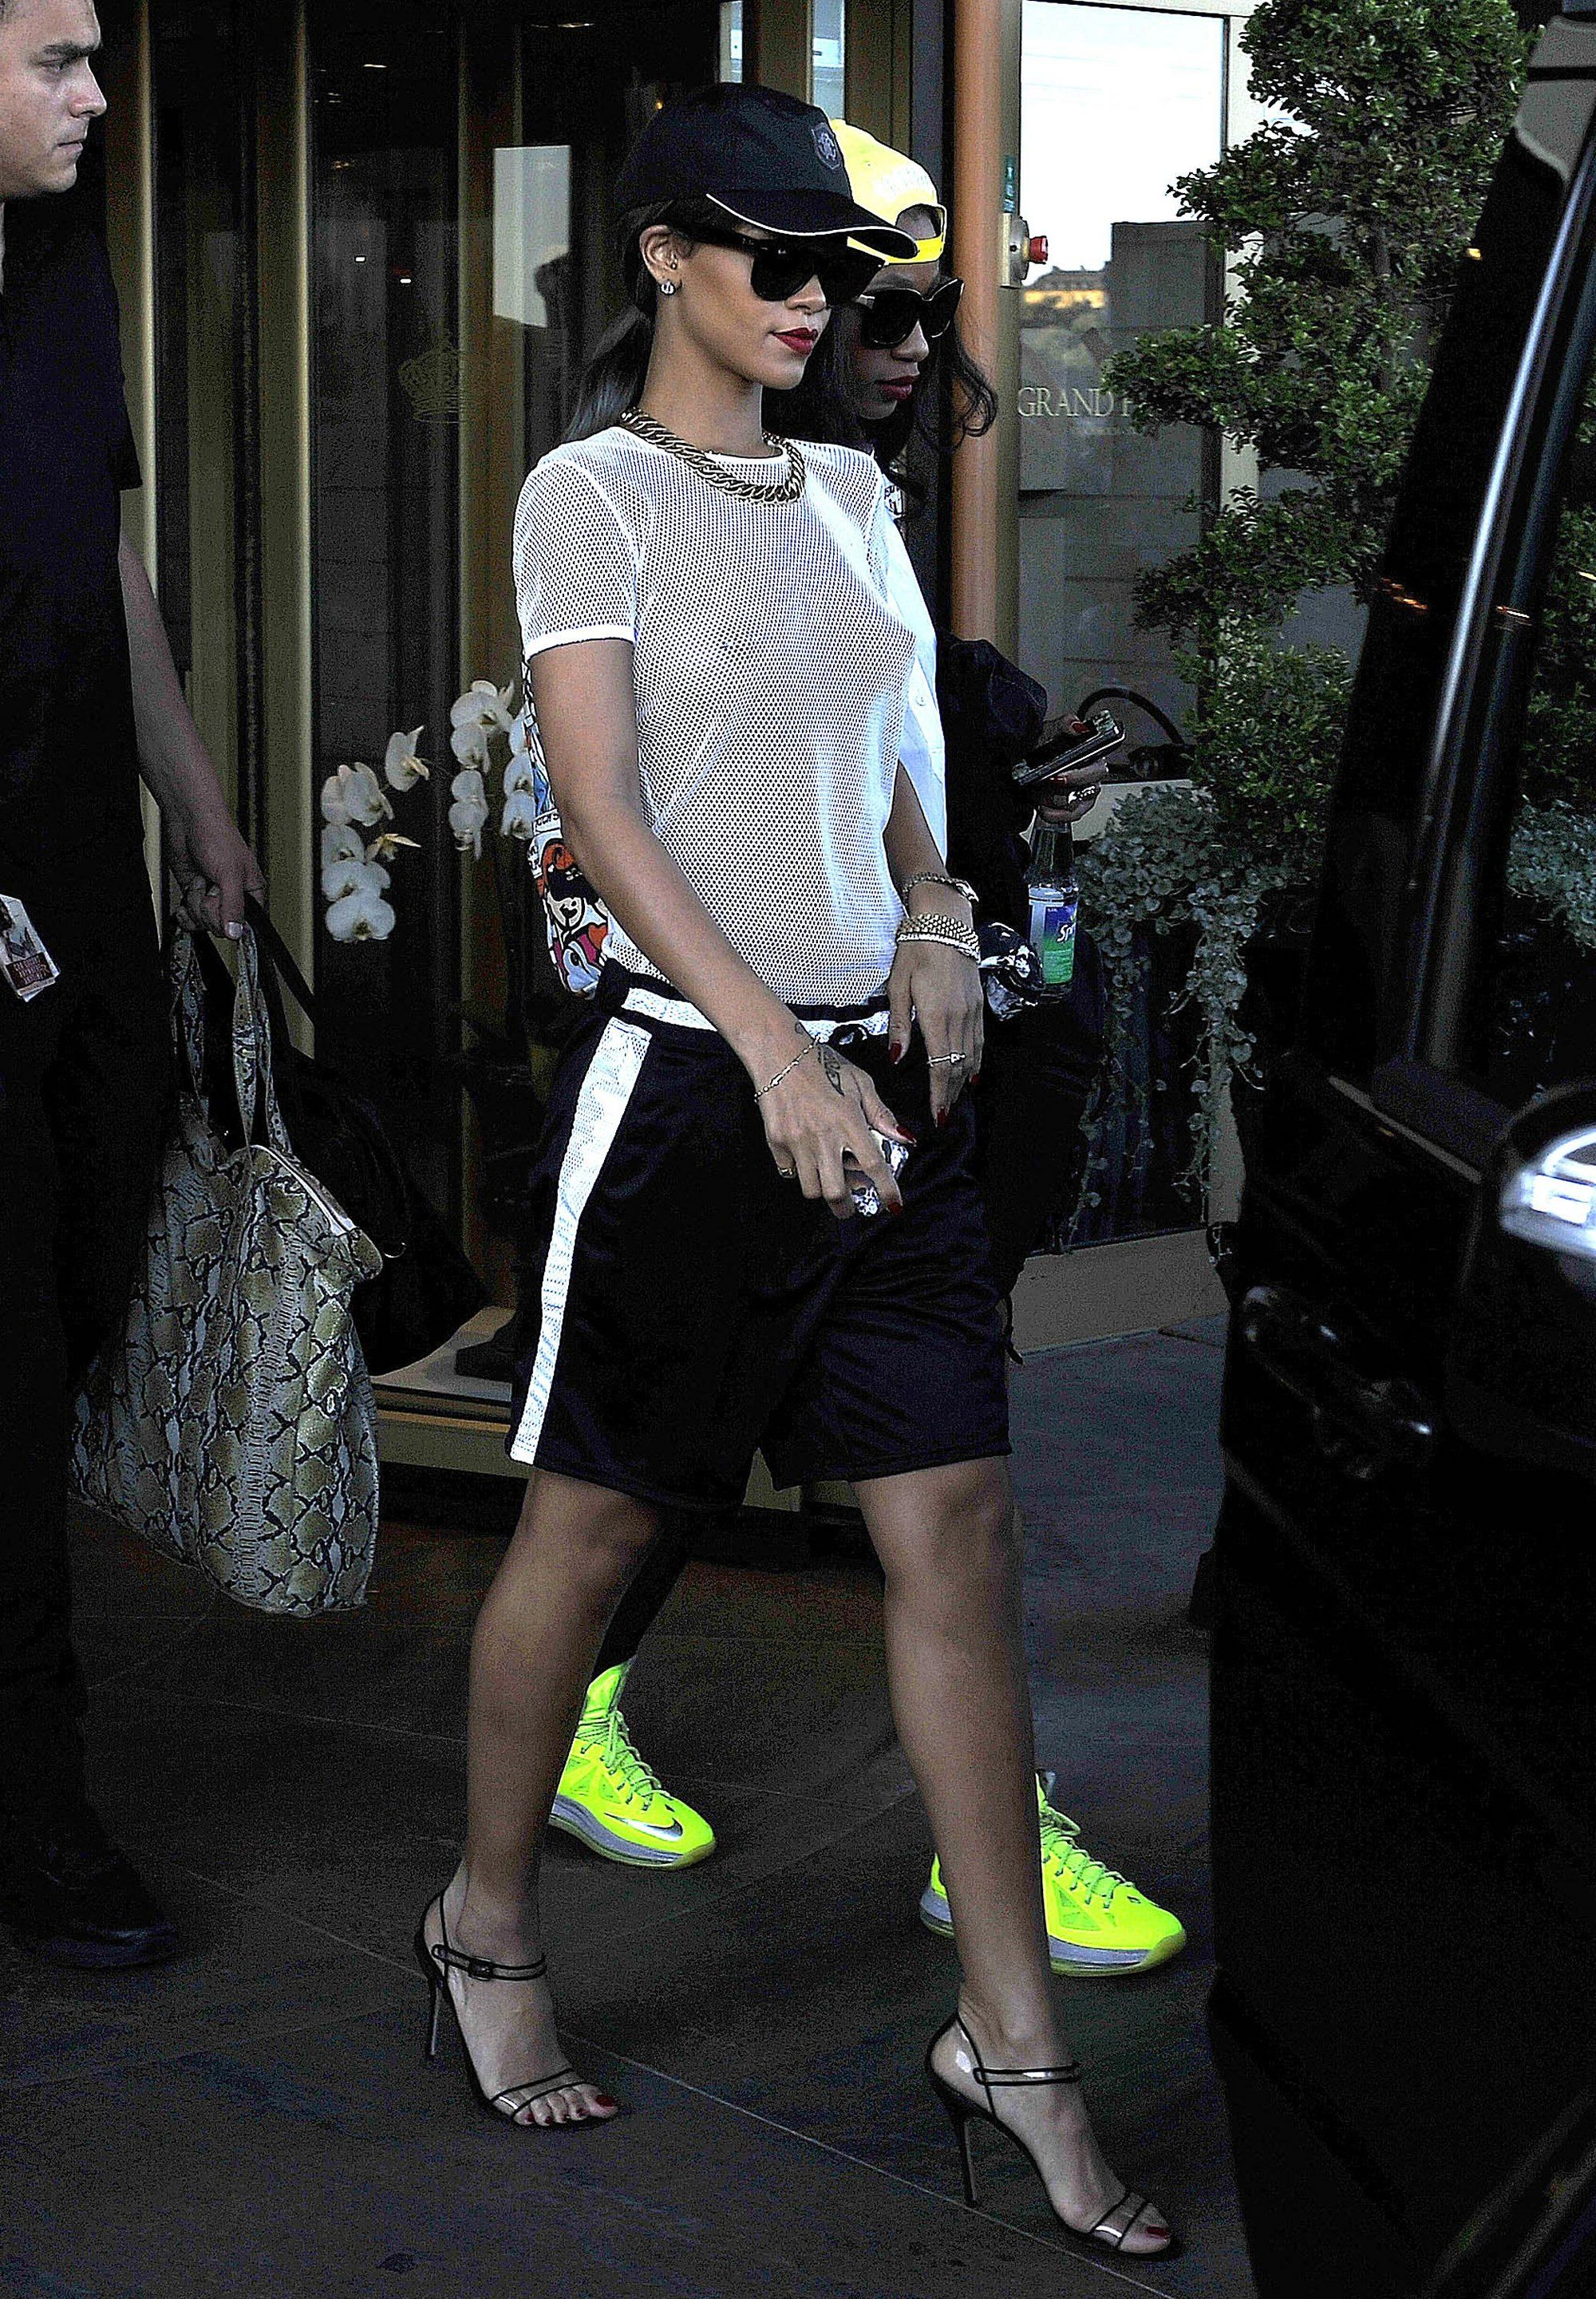 35a58cee97ce58 Rihanna - basketball shorts - aug 2016 Shorts Outfits Women